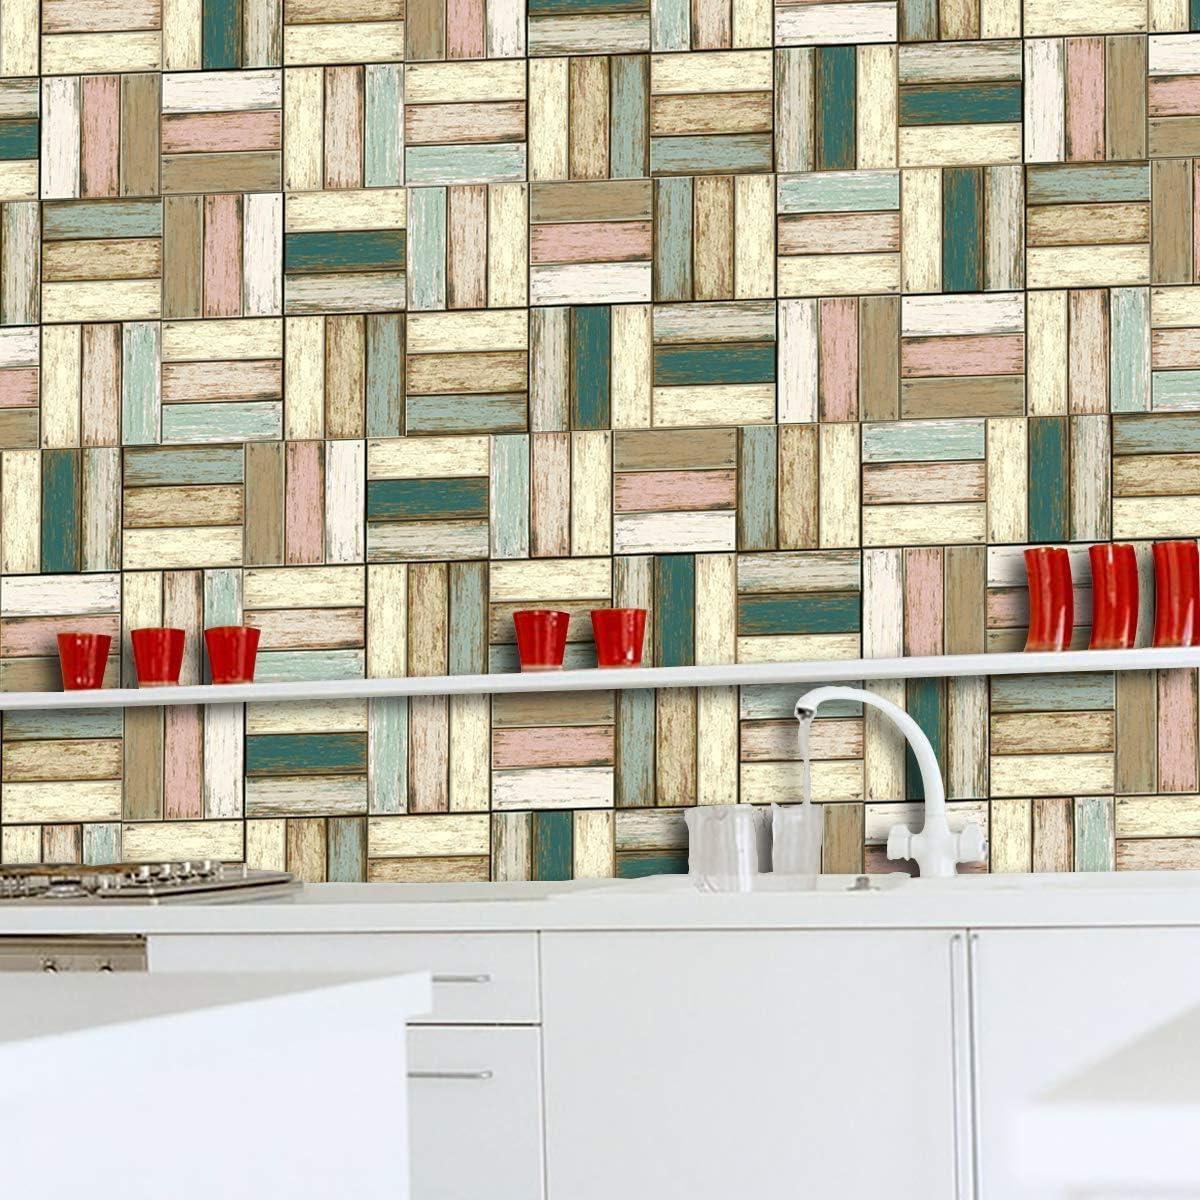 Aooyaoo Peel And Stick Wall Tile Self Adhesive Wall Stickers Stick On Backsplash Bathroom Bedroom 5 Sheets 7 3x7 3 Vinyl Decorative Tiles Home Kitchen Decorative Tiles Ohmychalk Com